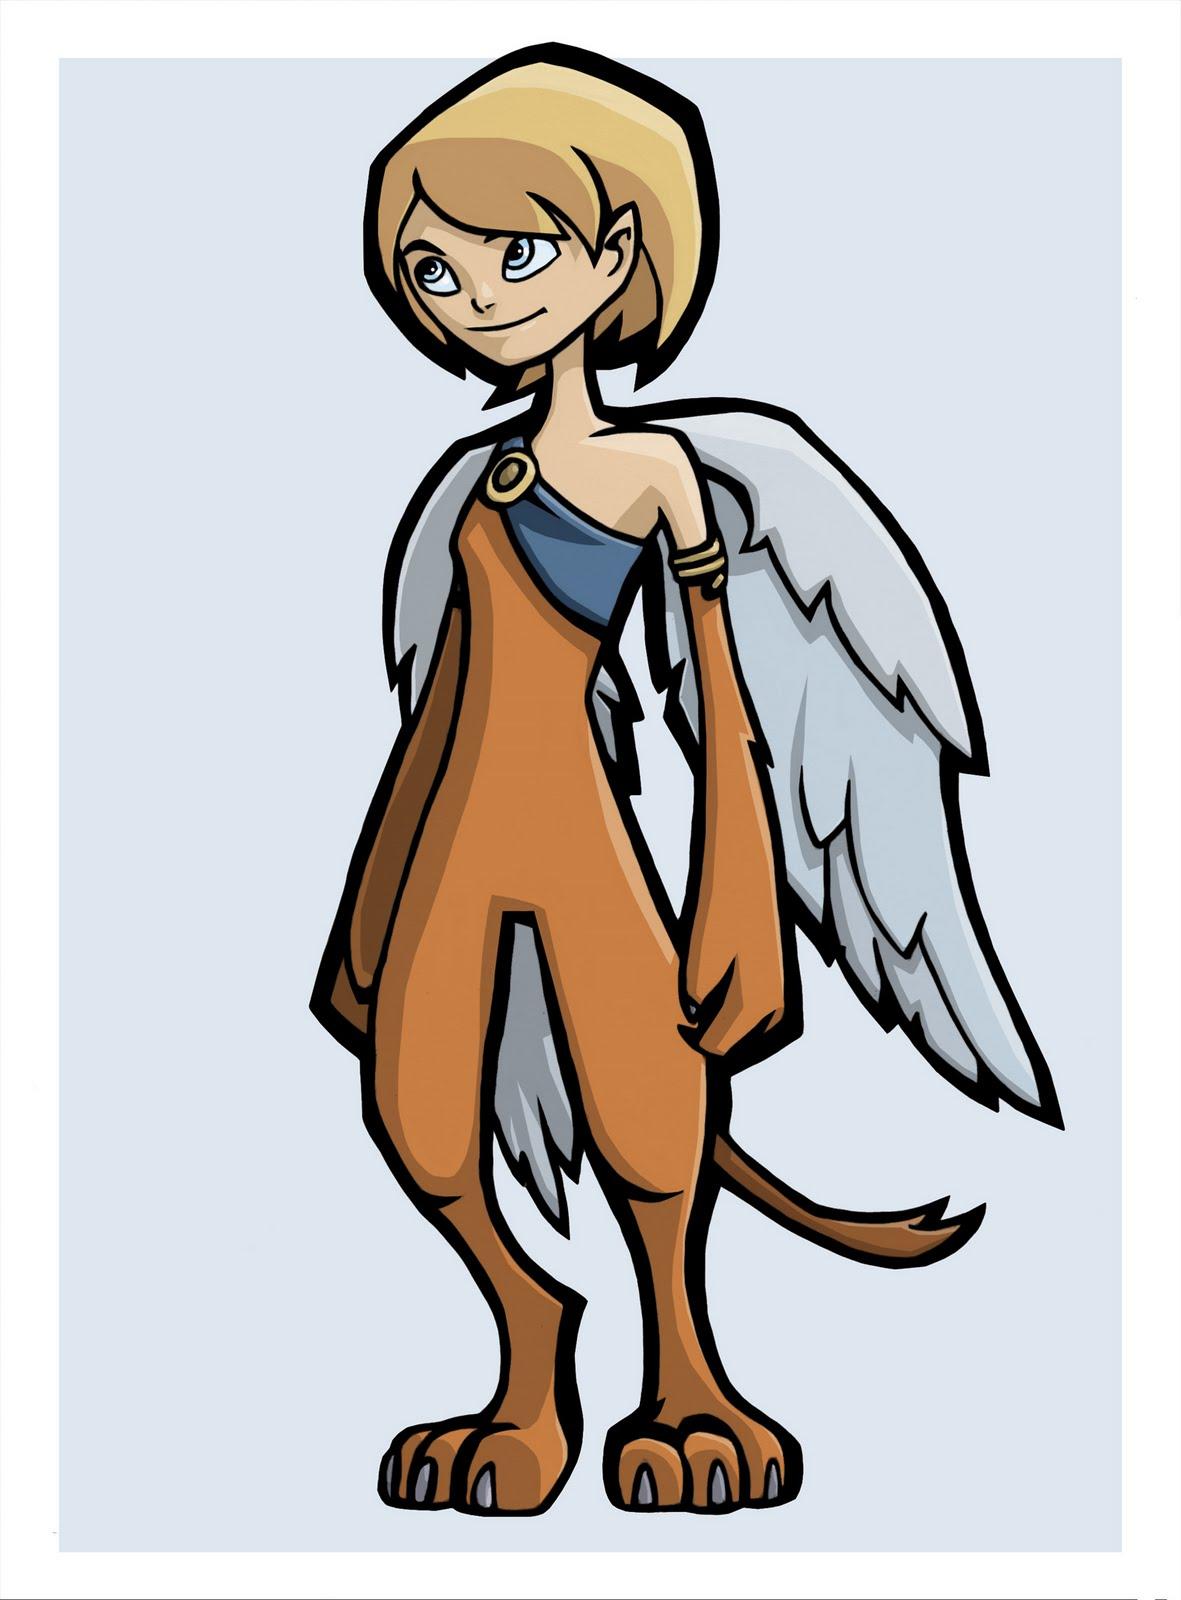 character design post - photo #24